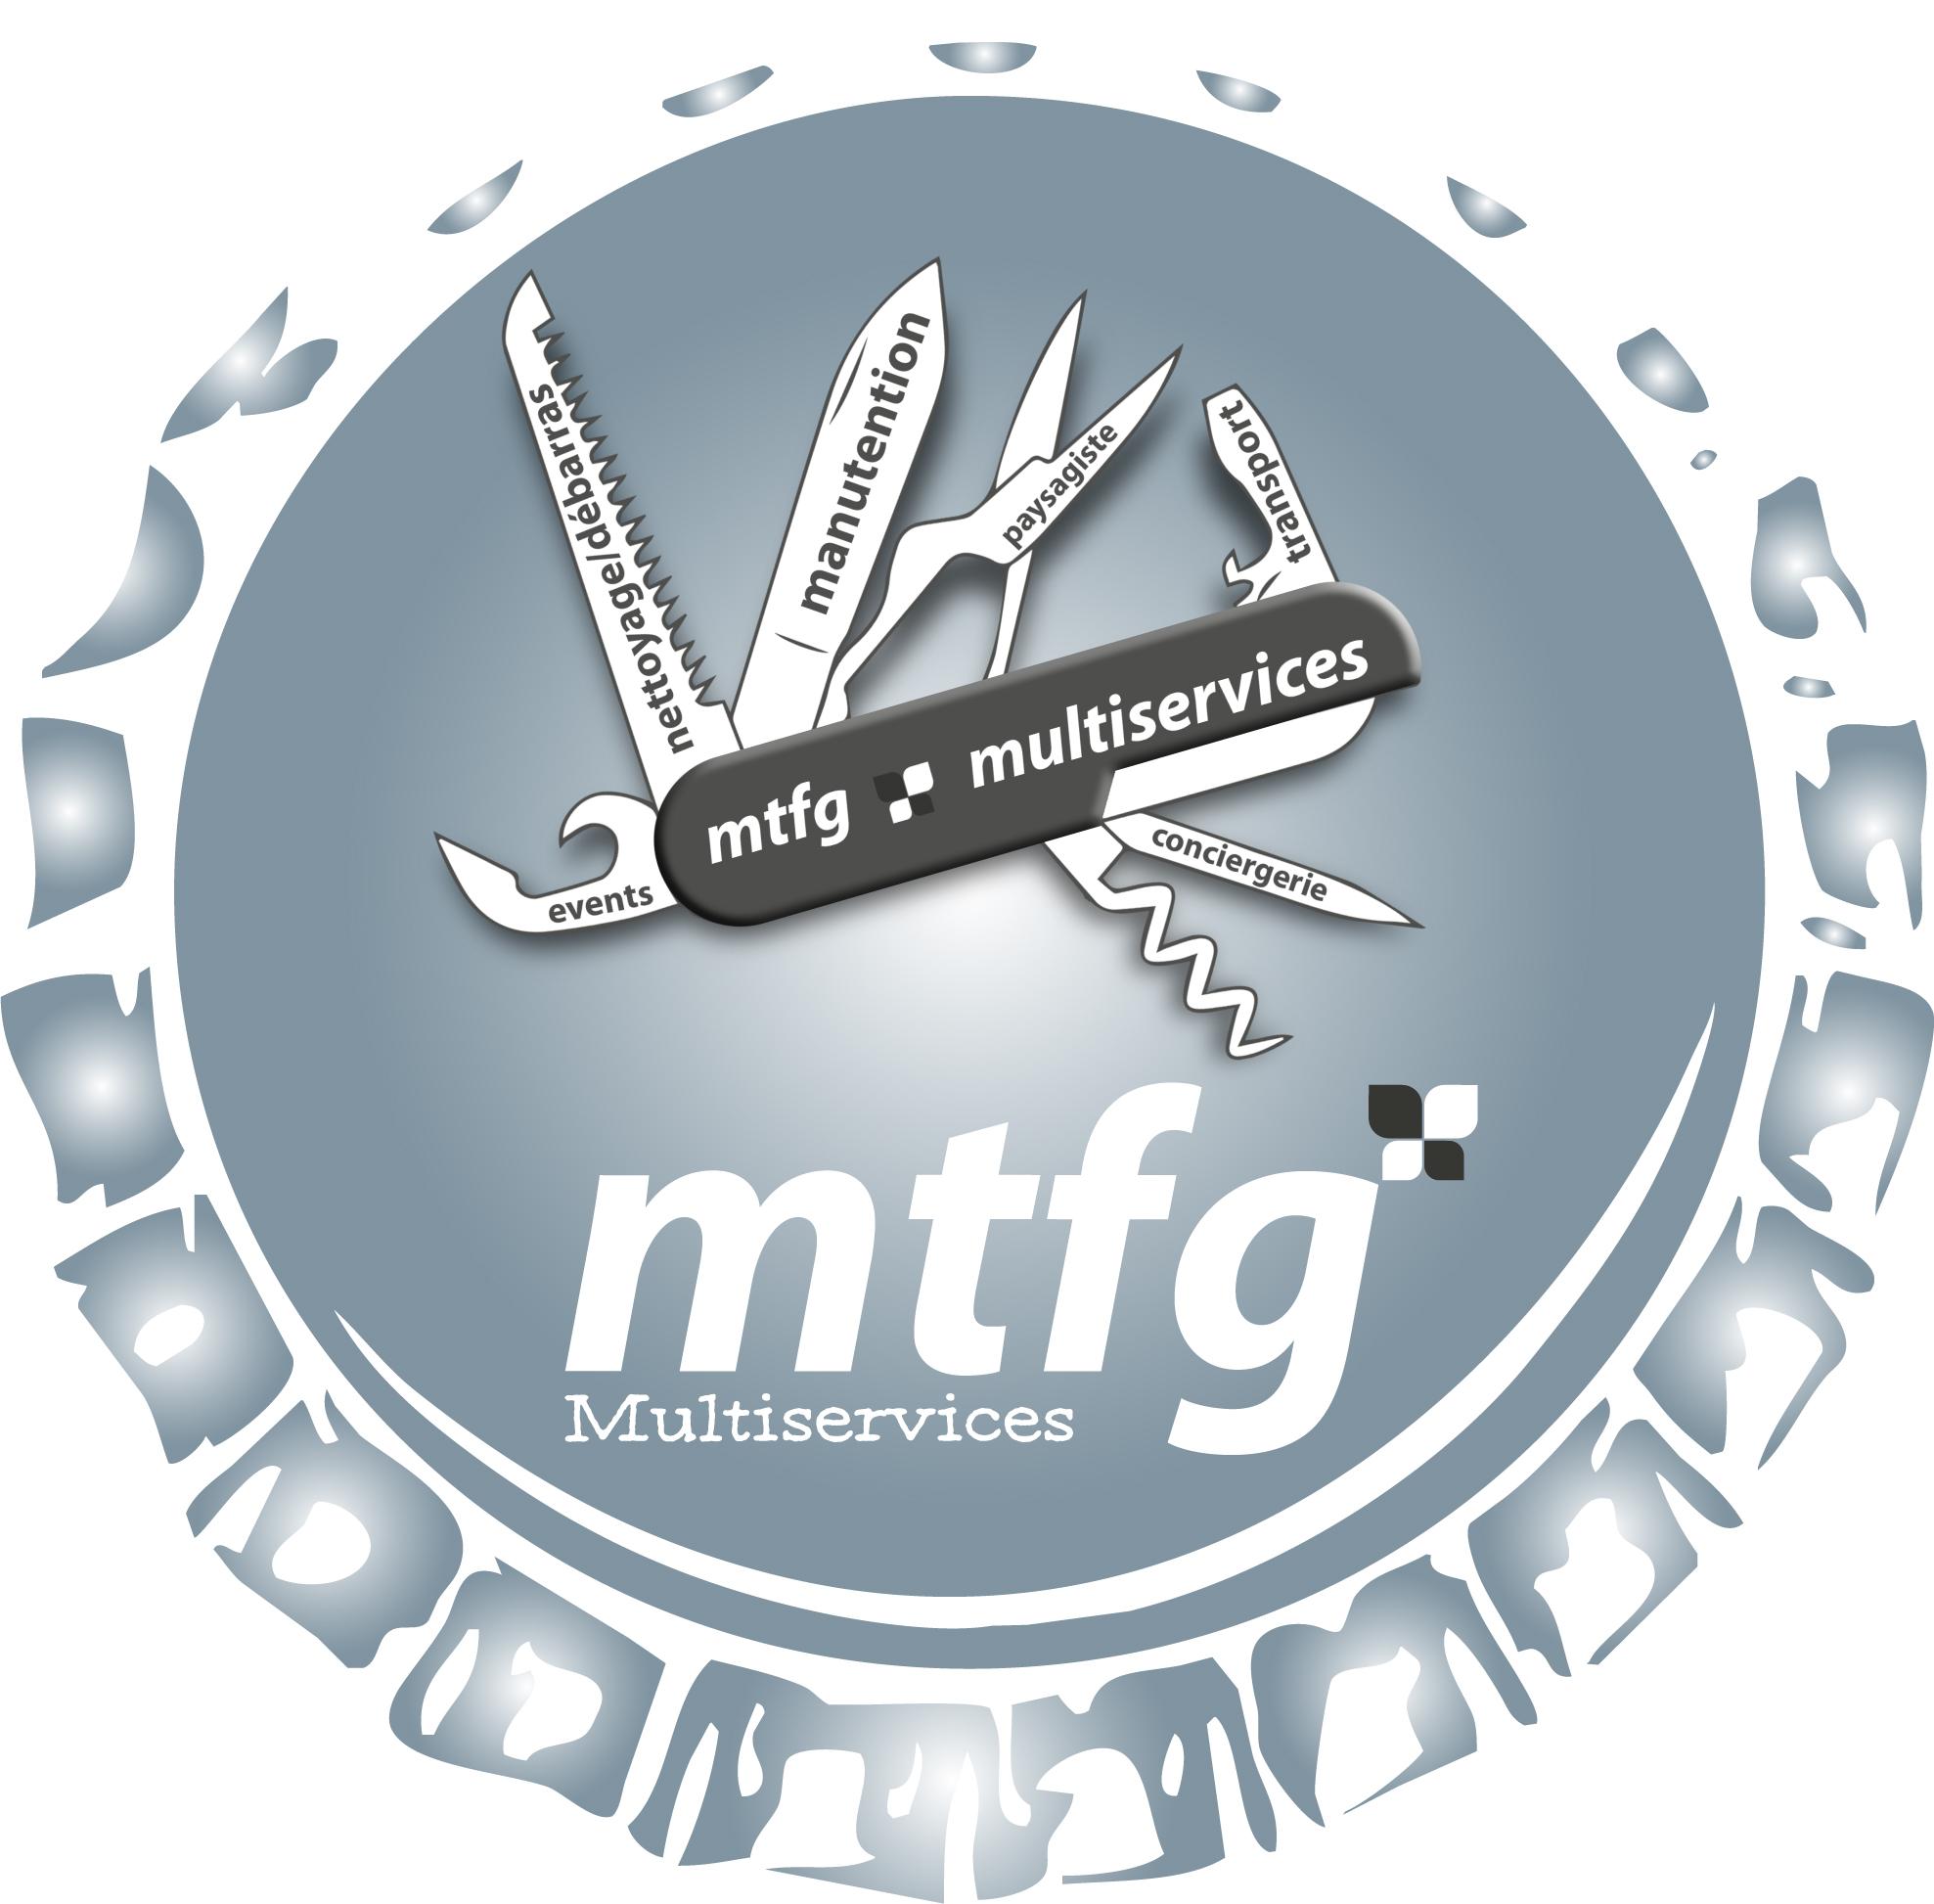 MTFG Multiservices